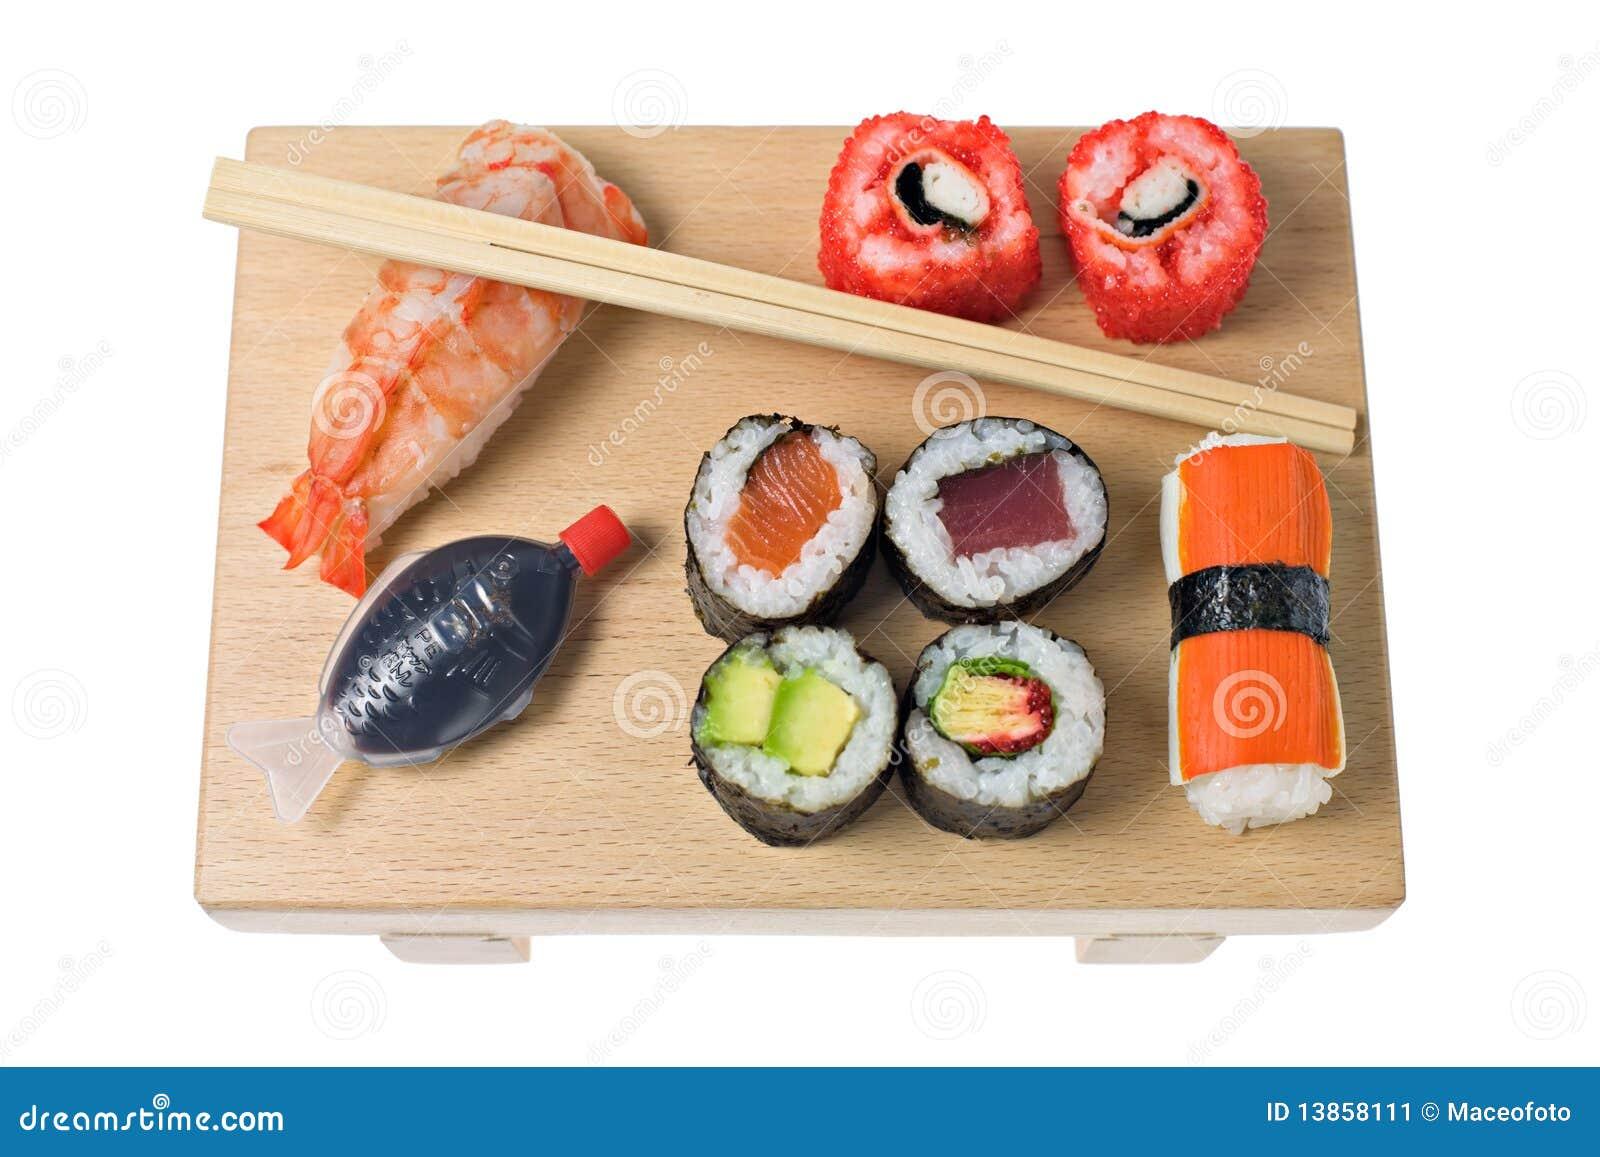 sushi arten stockbild bild 13858111. Black Bedroom Furniture Sets. Home Design Ideas